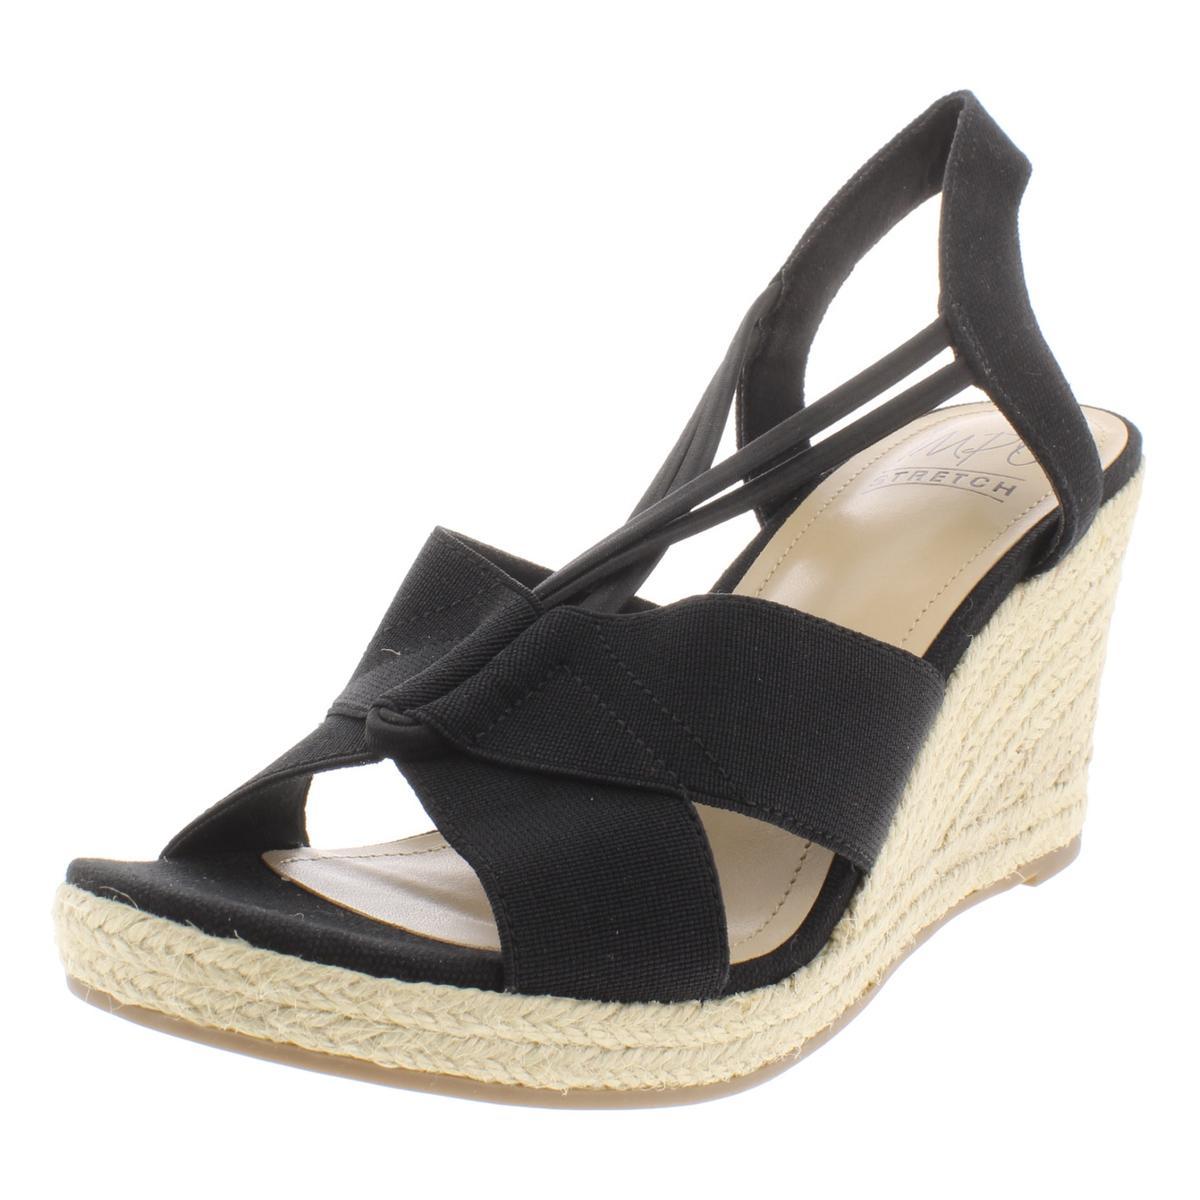 be9417932128 Details about Impo Womens Tegan Wedge T-Strap Canvas Espadrilles Sandals  BHFO 8112